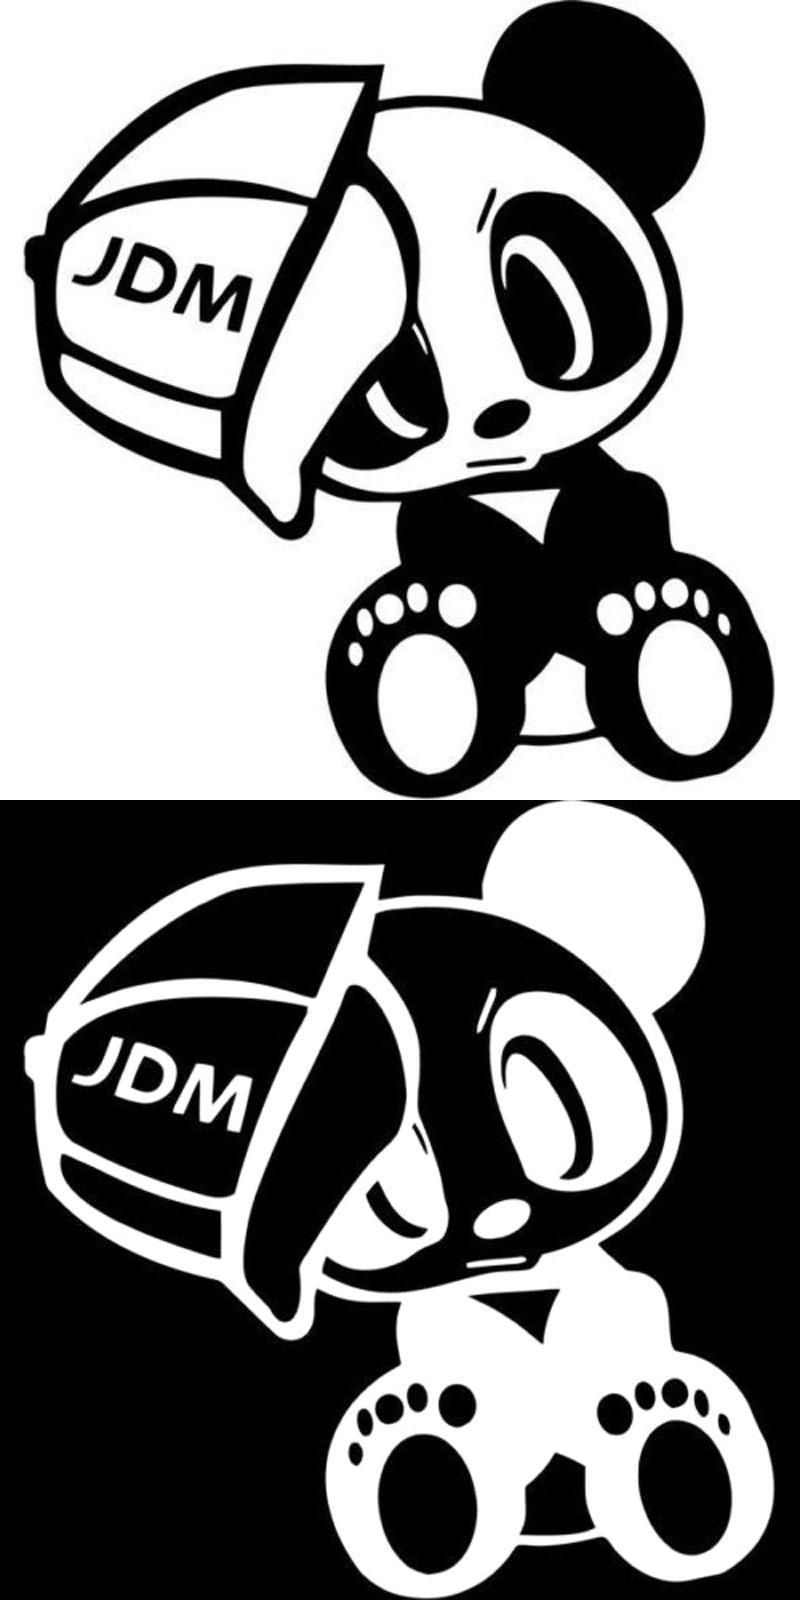 Visit To Buy 14 7cm 15 2cm Panda Jdm Vinyl Cute Animals Decal Sticker And Motorcycle Decorating Stickers Black Sliver C8 0851 Adverti Jdm Jdm Stickers Vinyl [ 1600 x 800 Pixel ]